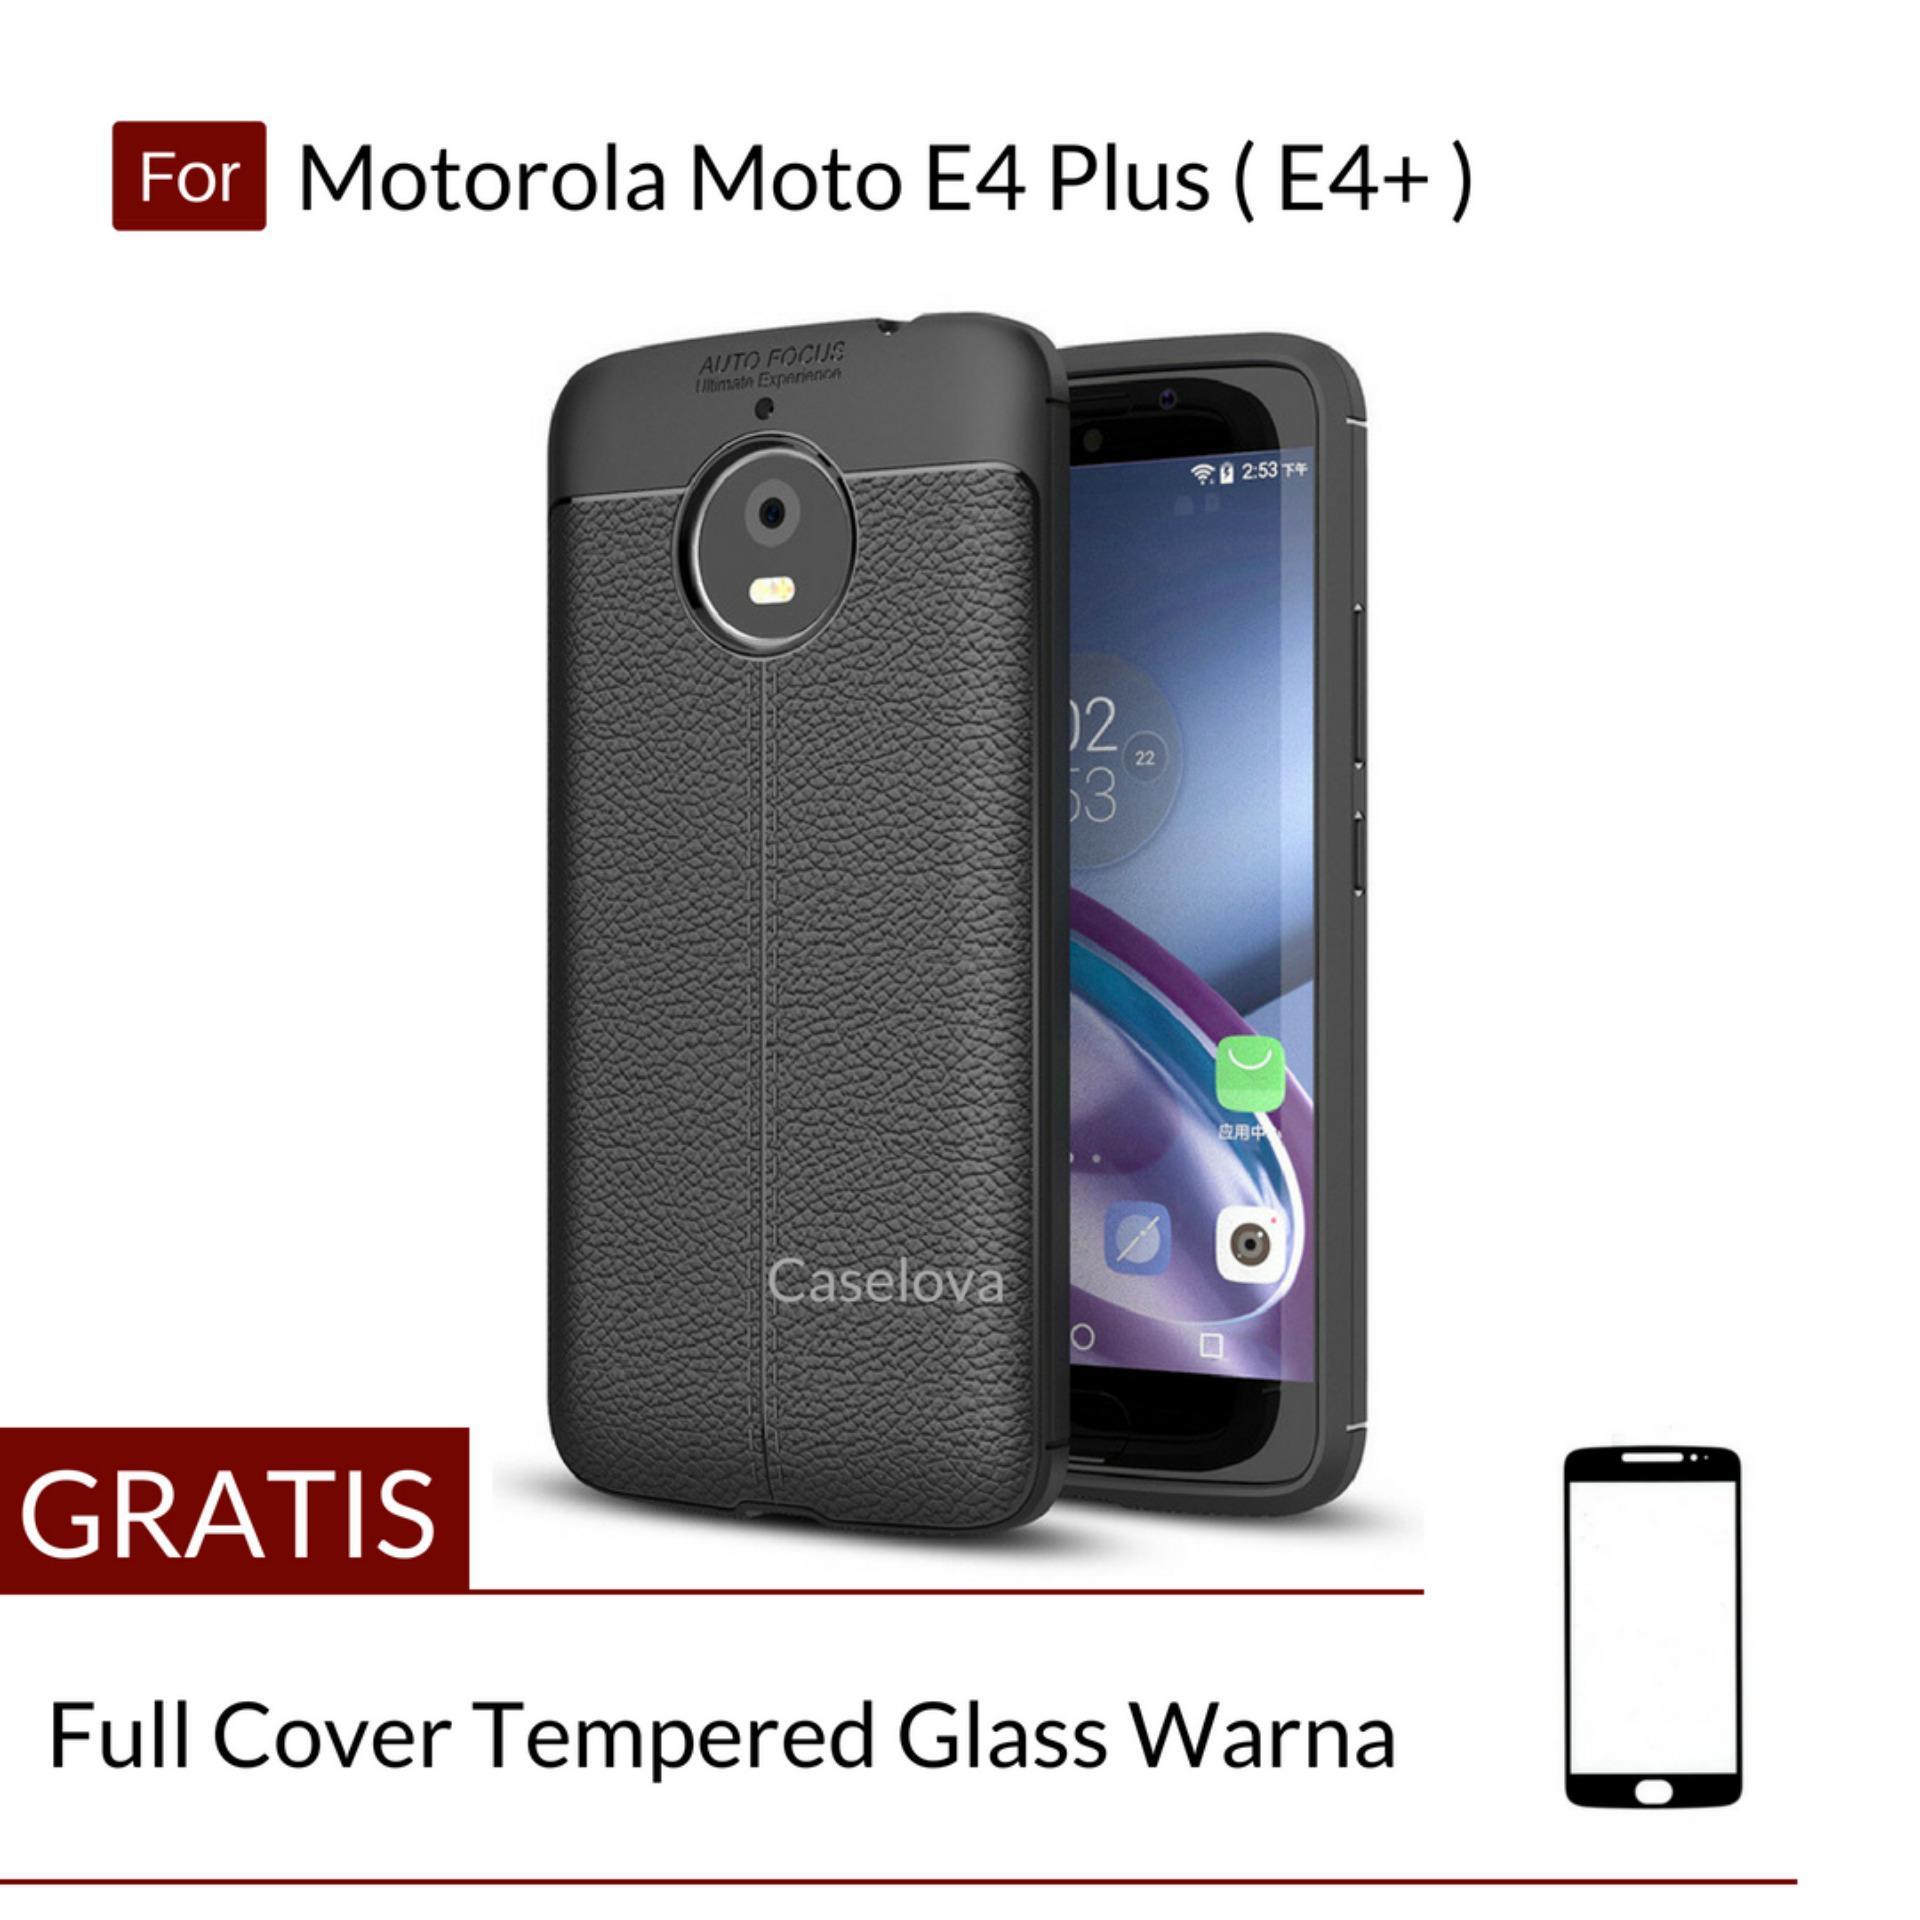 Caselova Ultimate Experience Shockproof Premium Quality Hybrid Case For Motorola Moto E4 Plus ( E4+ )